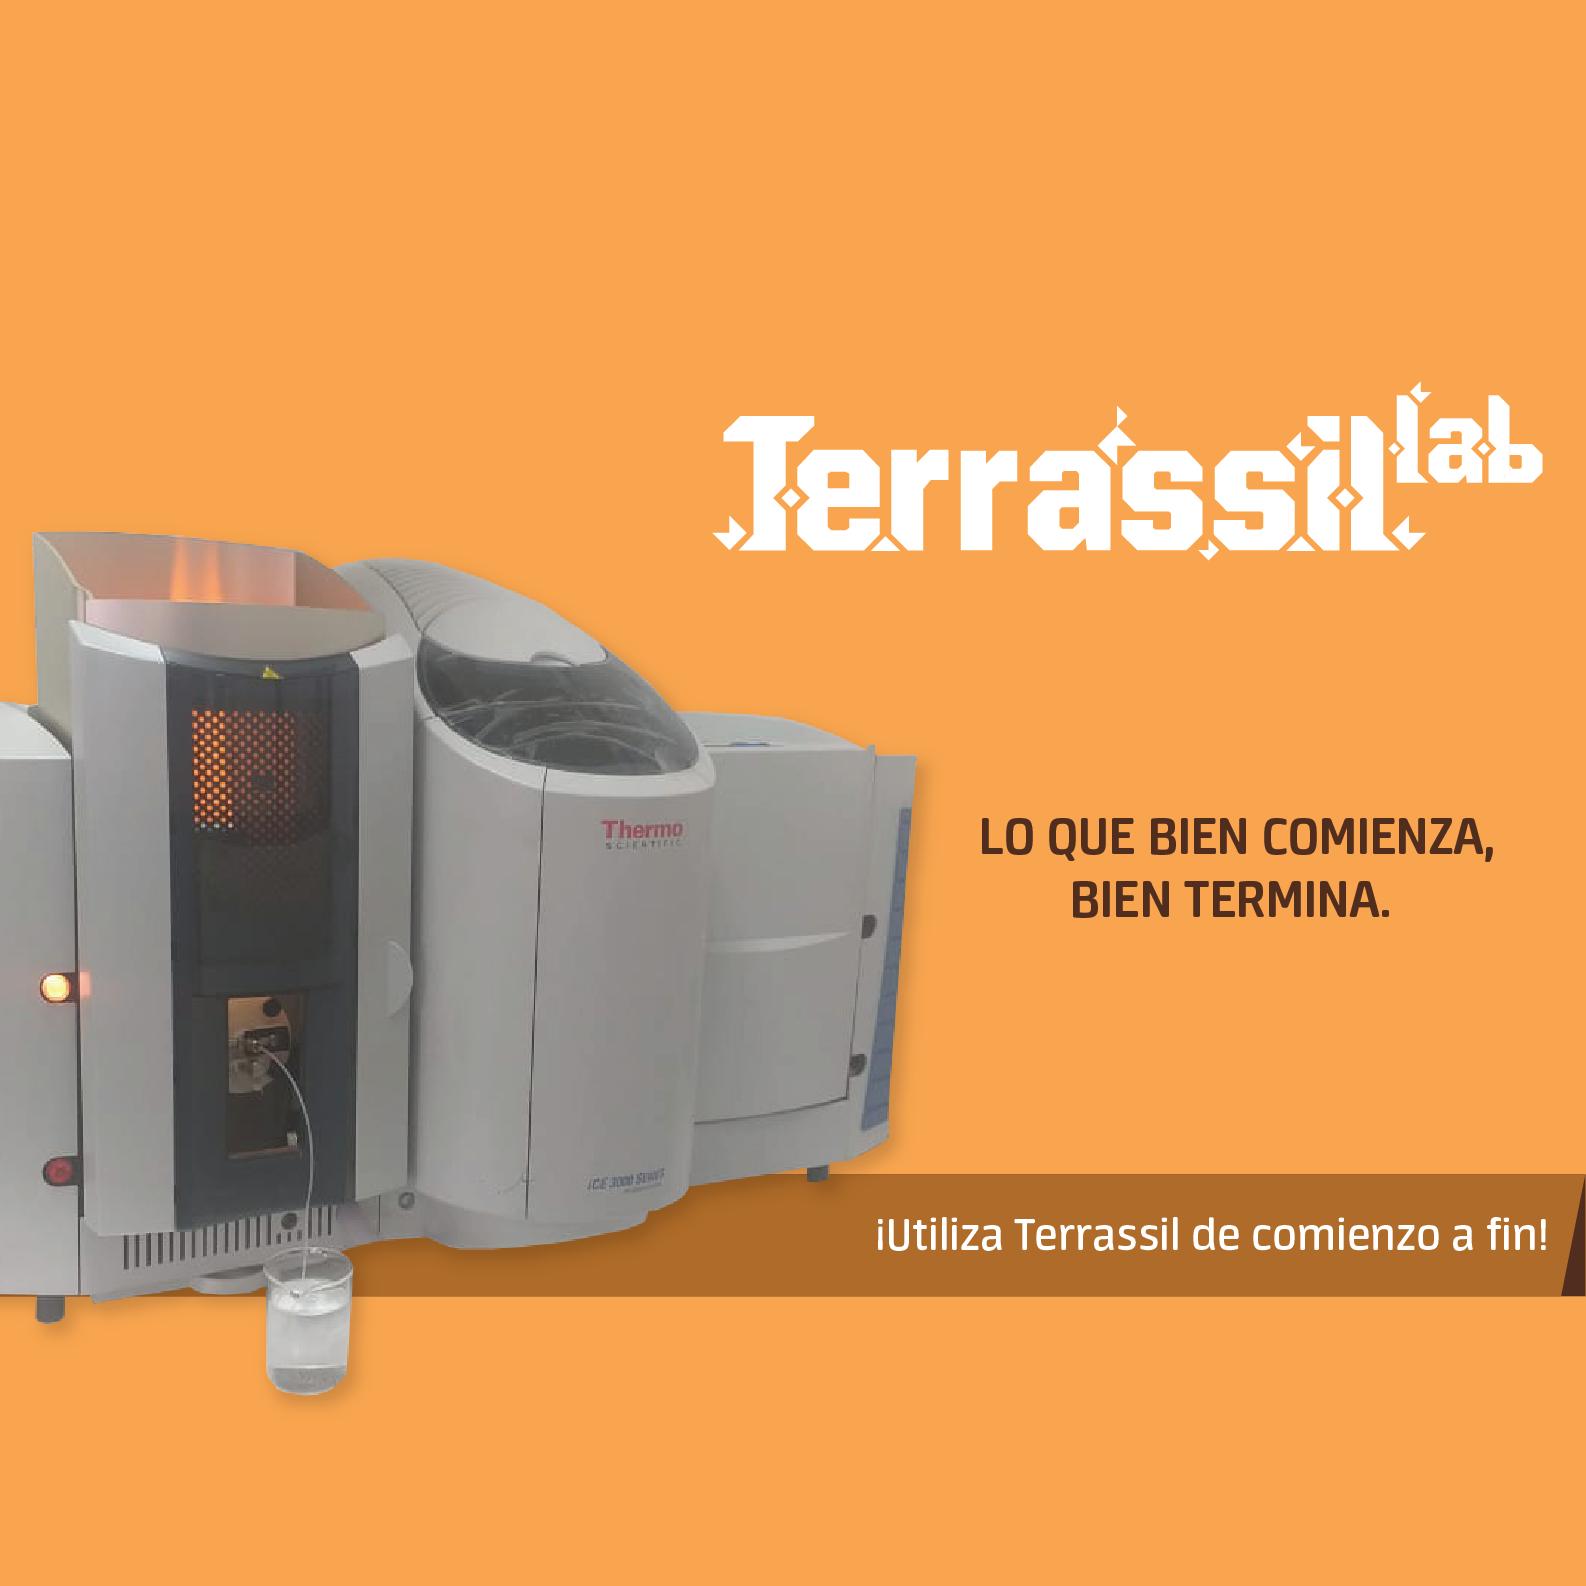 Terrassil lab slogan